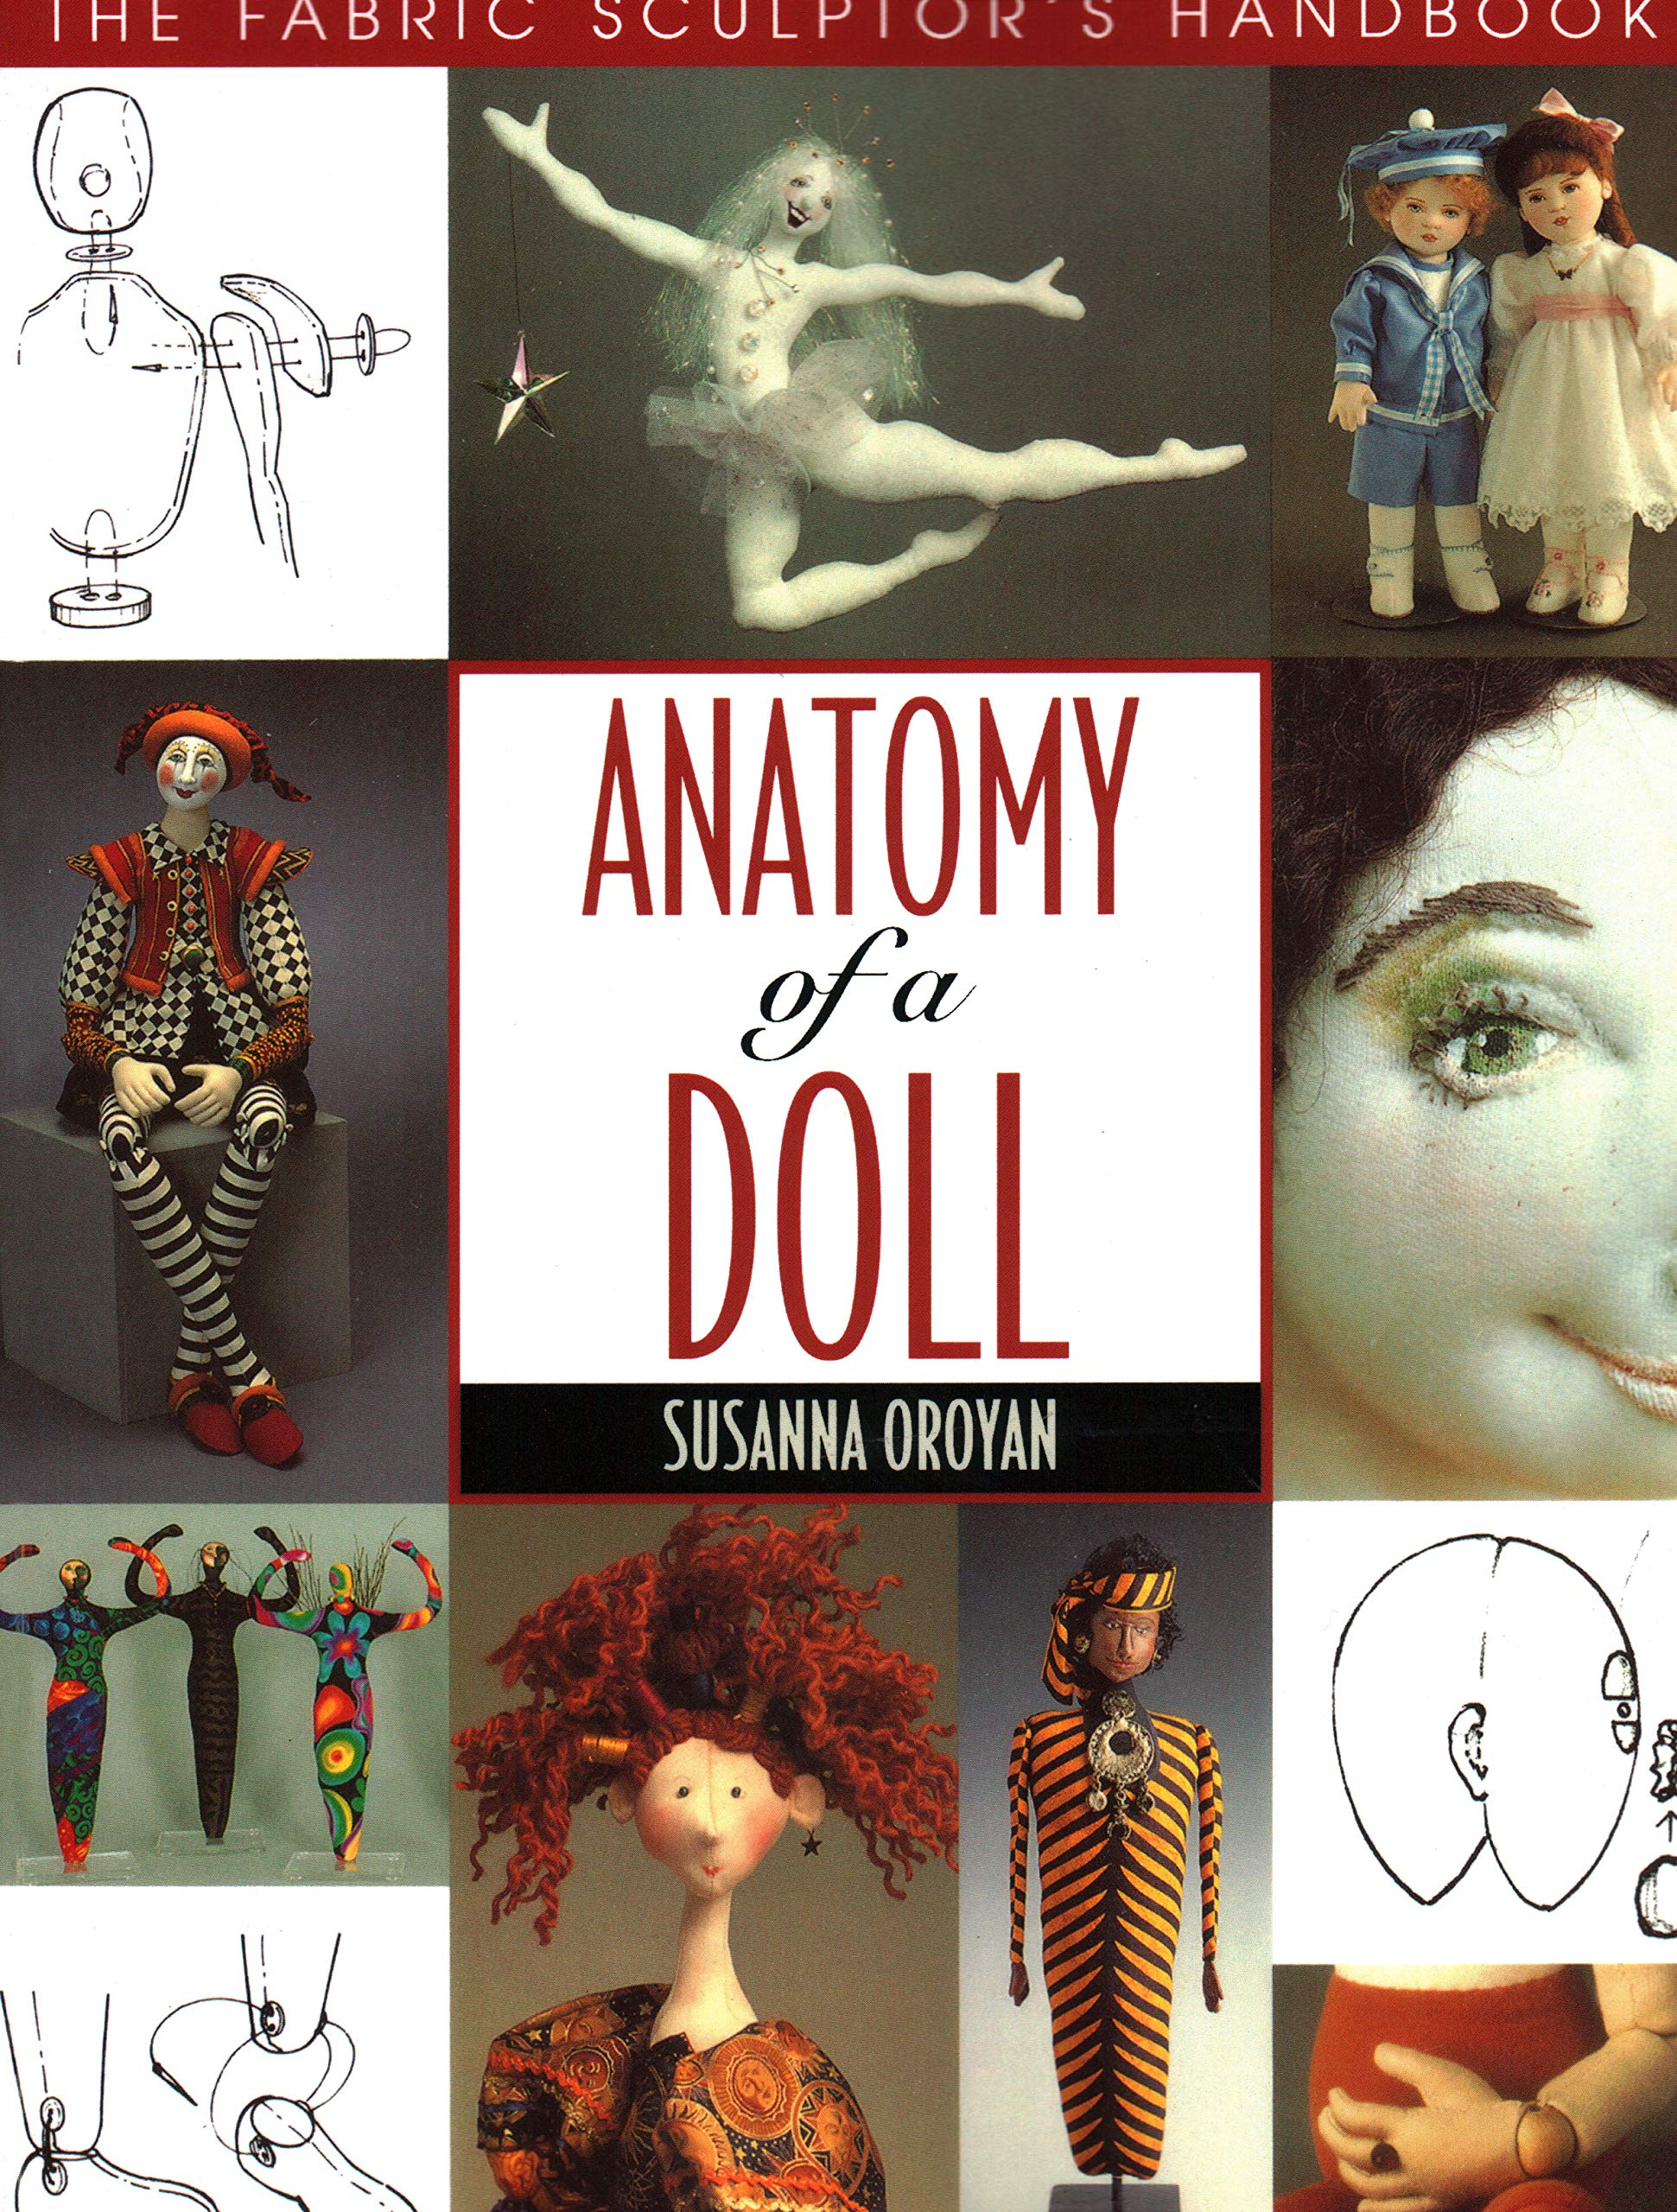 Anatomy of a Doll. the Fabric Sculptor's Handbook